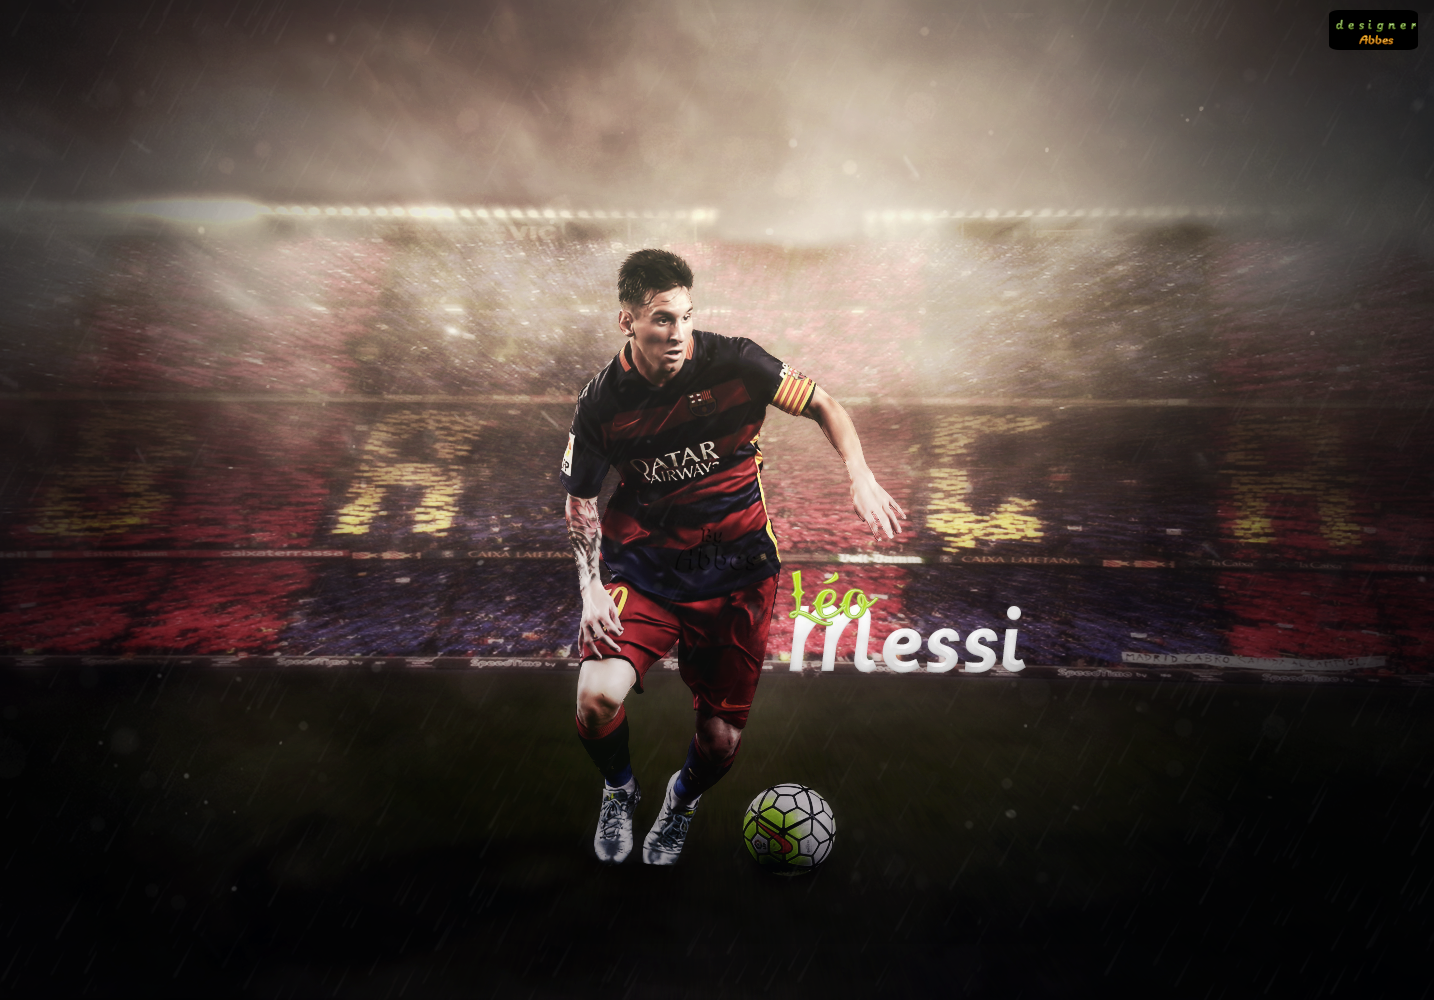 Messi Wallpaper 2016 1434x1000